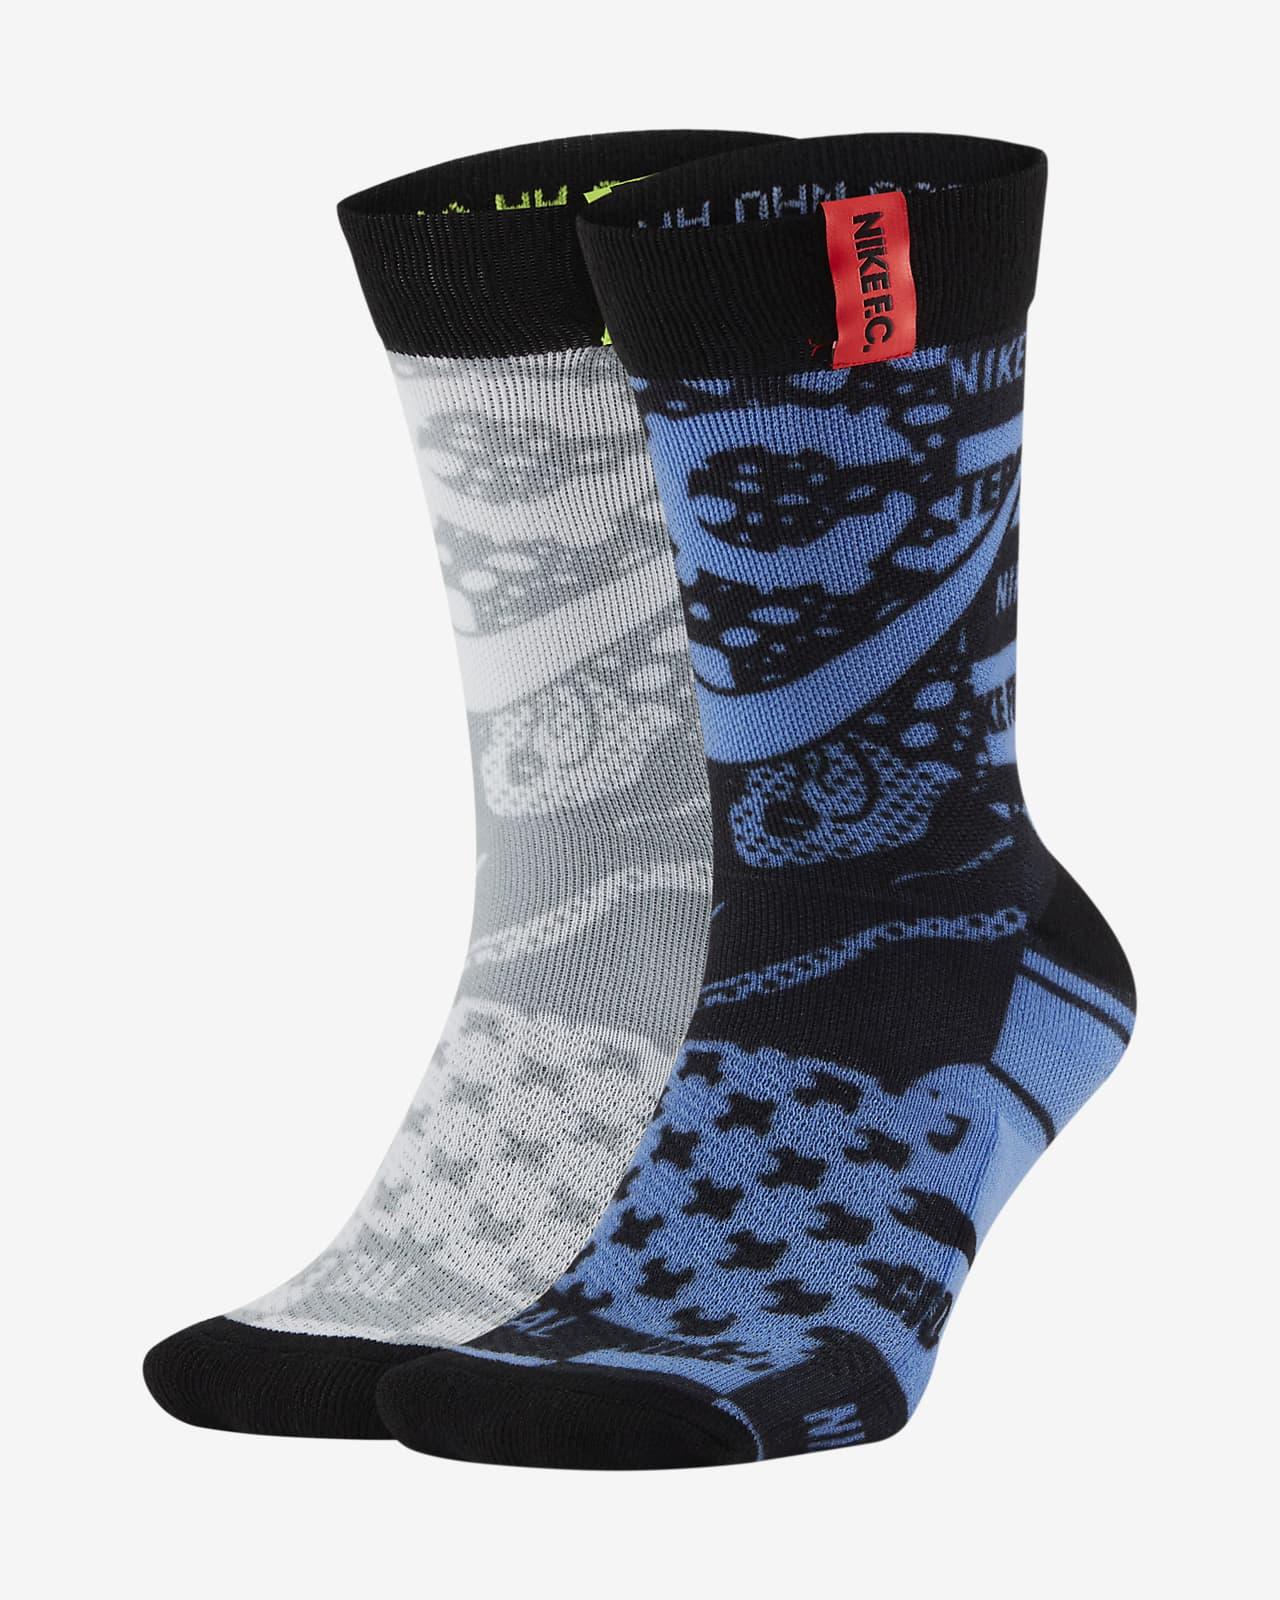 Nike F.C. Graphic Football Crew Socks (2 Pairs)